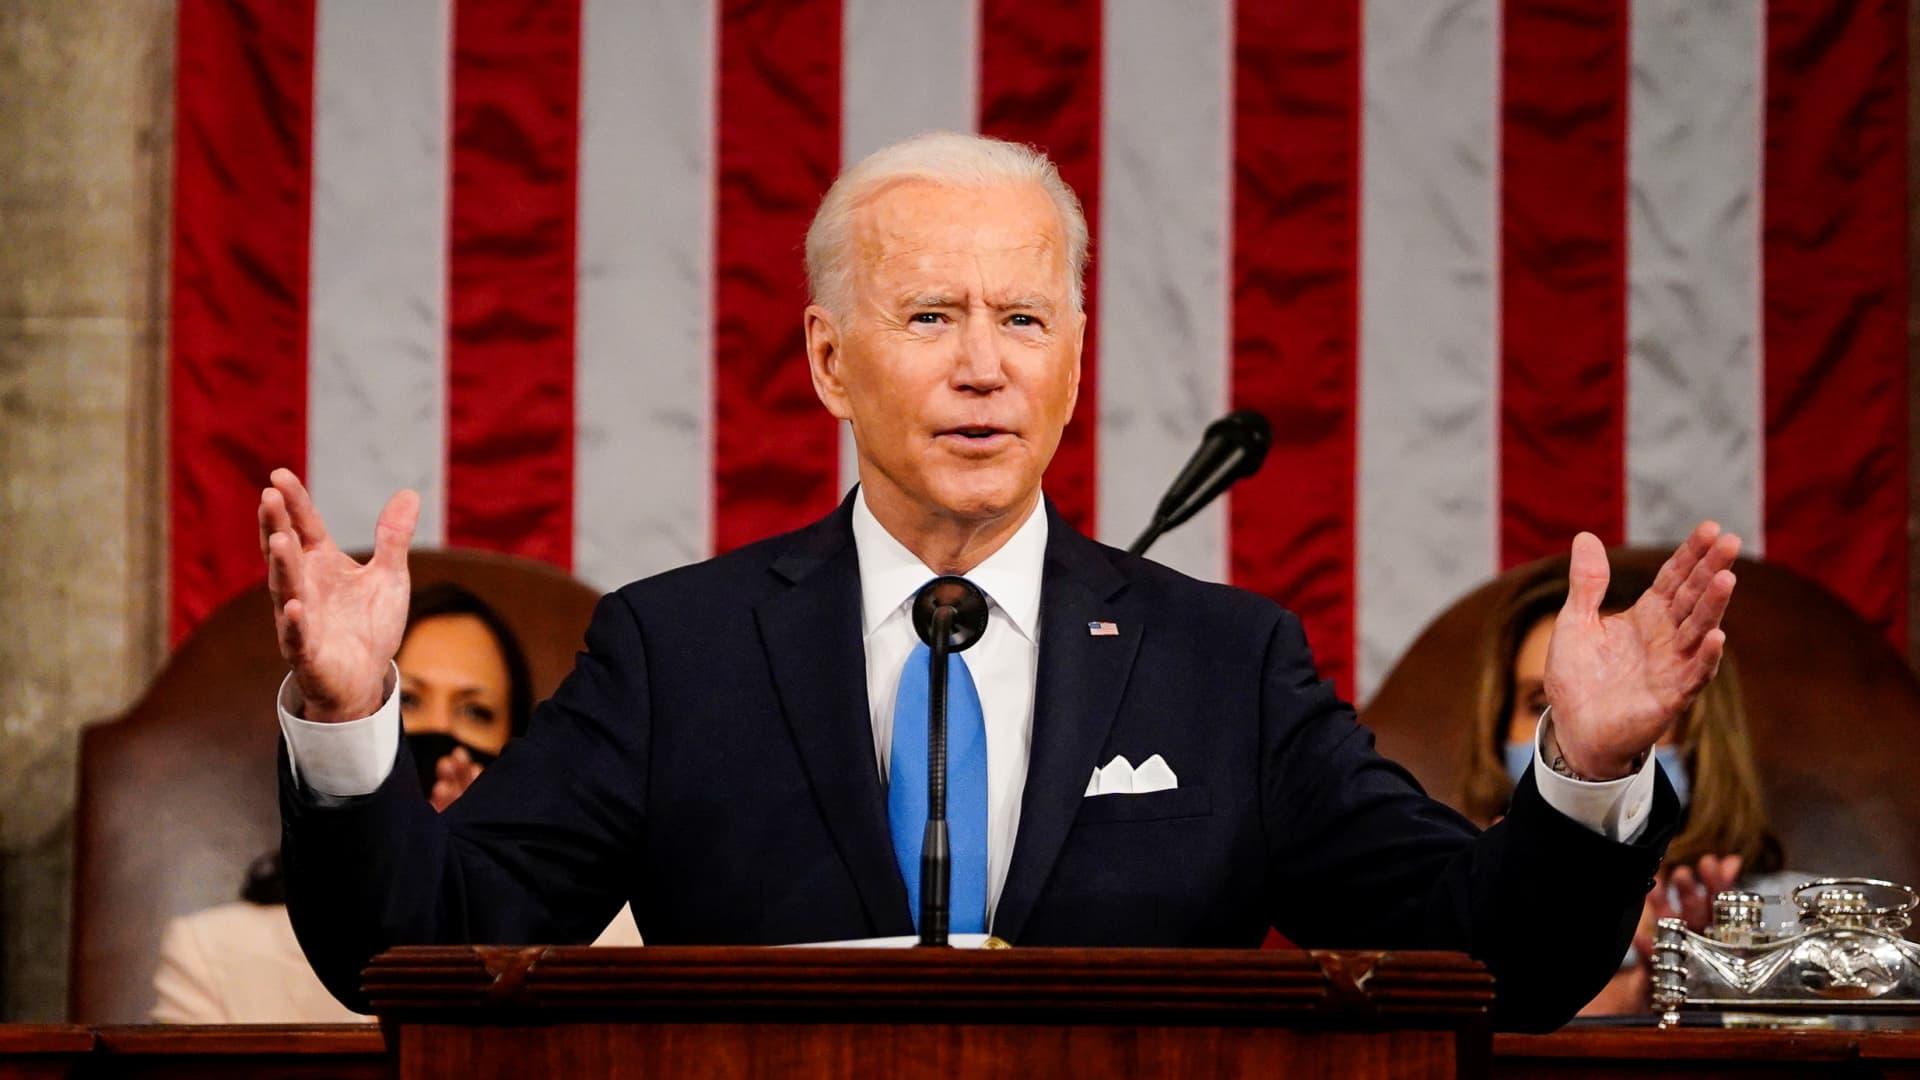 President Joe Biden addresses a joint session of Congress at the U.S. Capitol in Washington, DC, U.S. April 28, 2021.